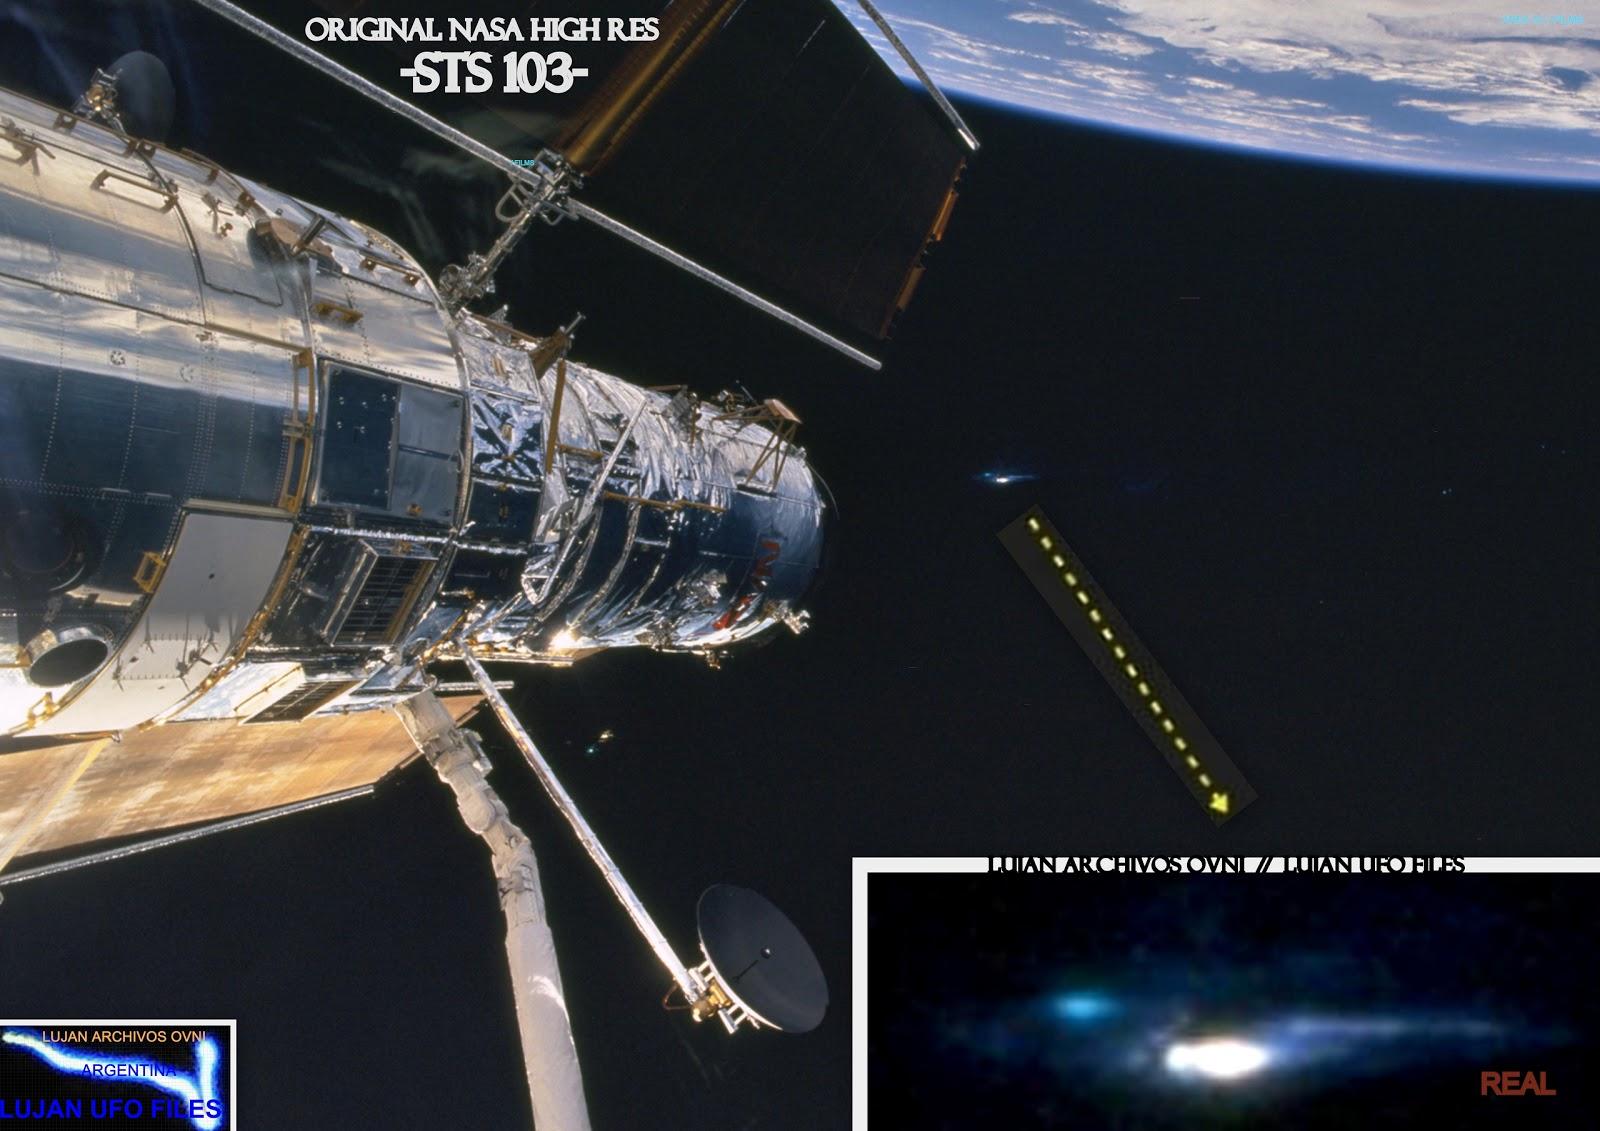 http://4.bp.blogspot.com/-QlYDKYdYSh0/UOT7RJtpJbI/AAAAAAAAF5k/qkIJ2_FL-Ic/s1600/ORIGINAL+NASA+STS+103.jpg